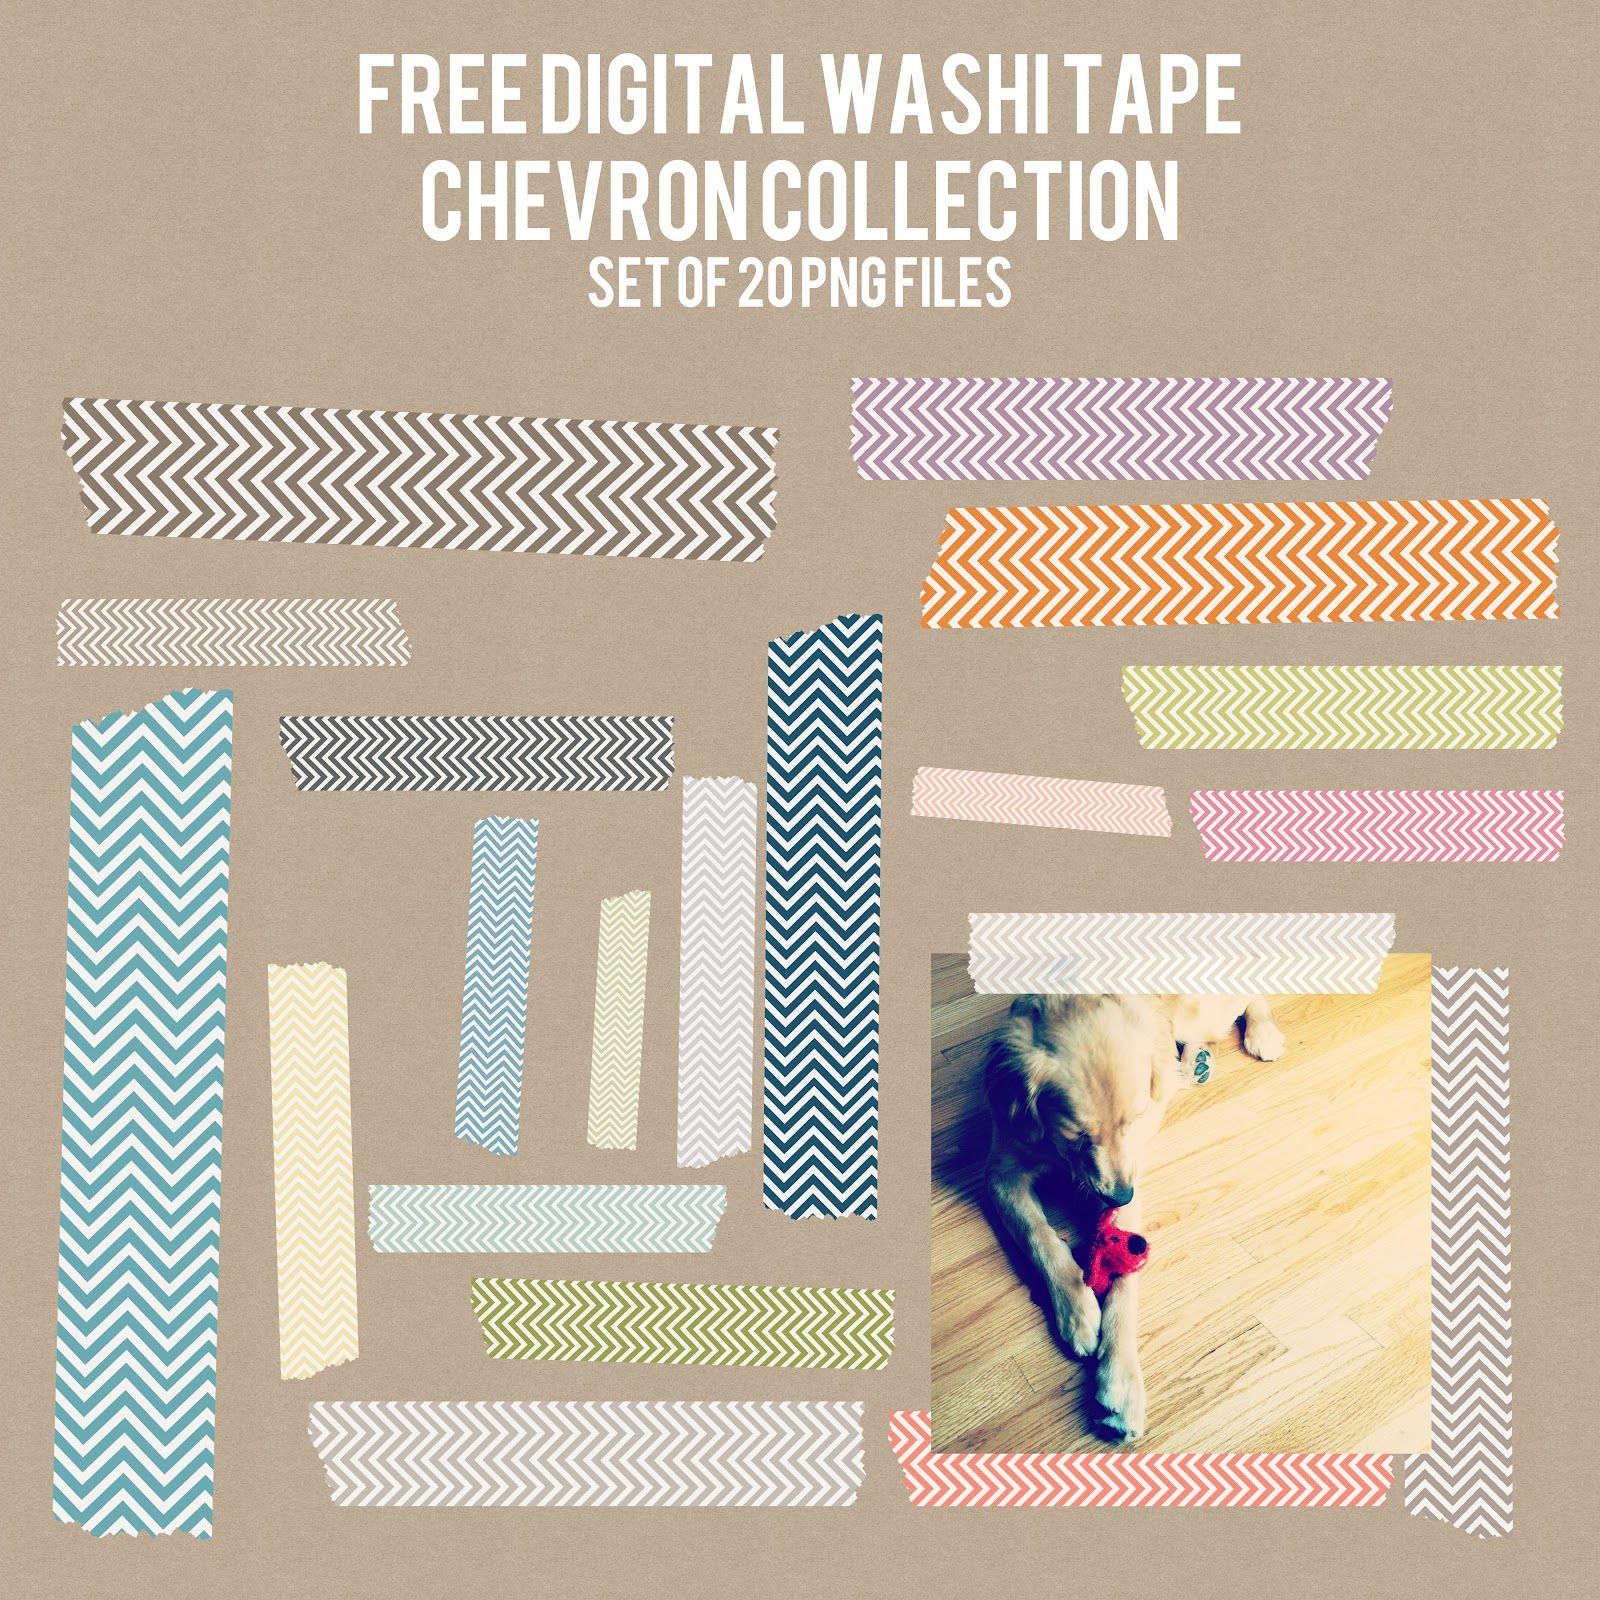 Freebie Friday Digital Washi Tape Washi Tape Design Freebie Washi